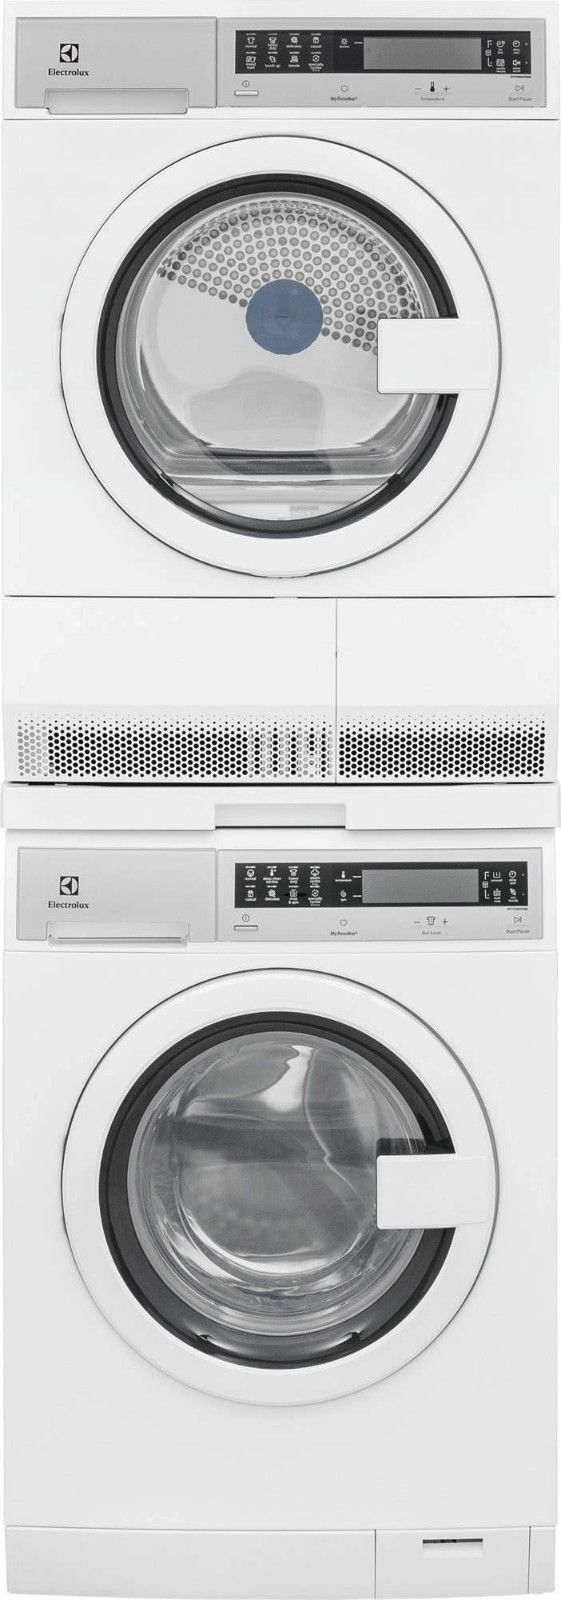 "Electrolux 24"" Washer, Electric Dryer & Stack Kit. EIFLS20QSW & EIED200QSW"